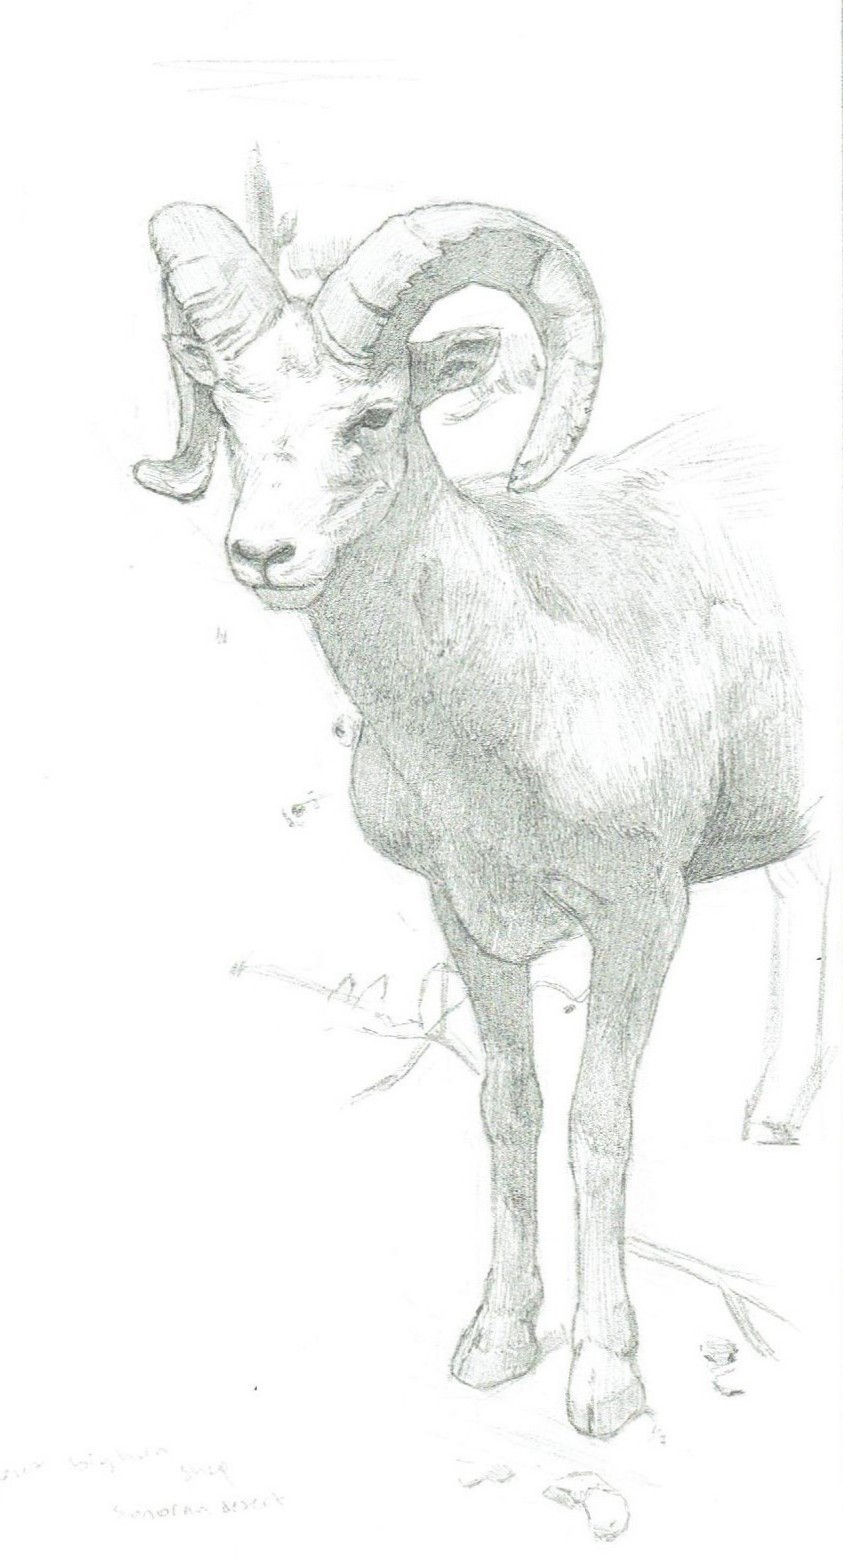 4b44a21c0f55db6eeb465e3b02a2b45ejpg. how to draw a bighorn sheep how ...